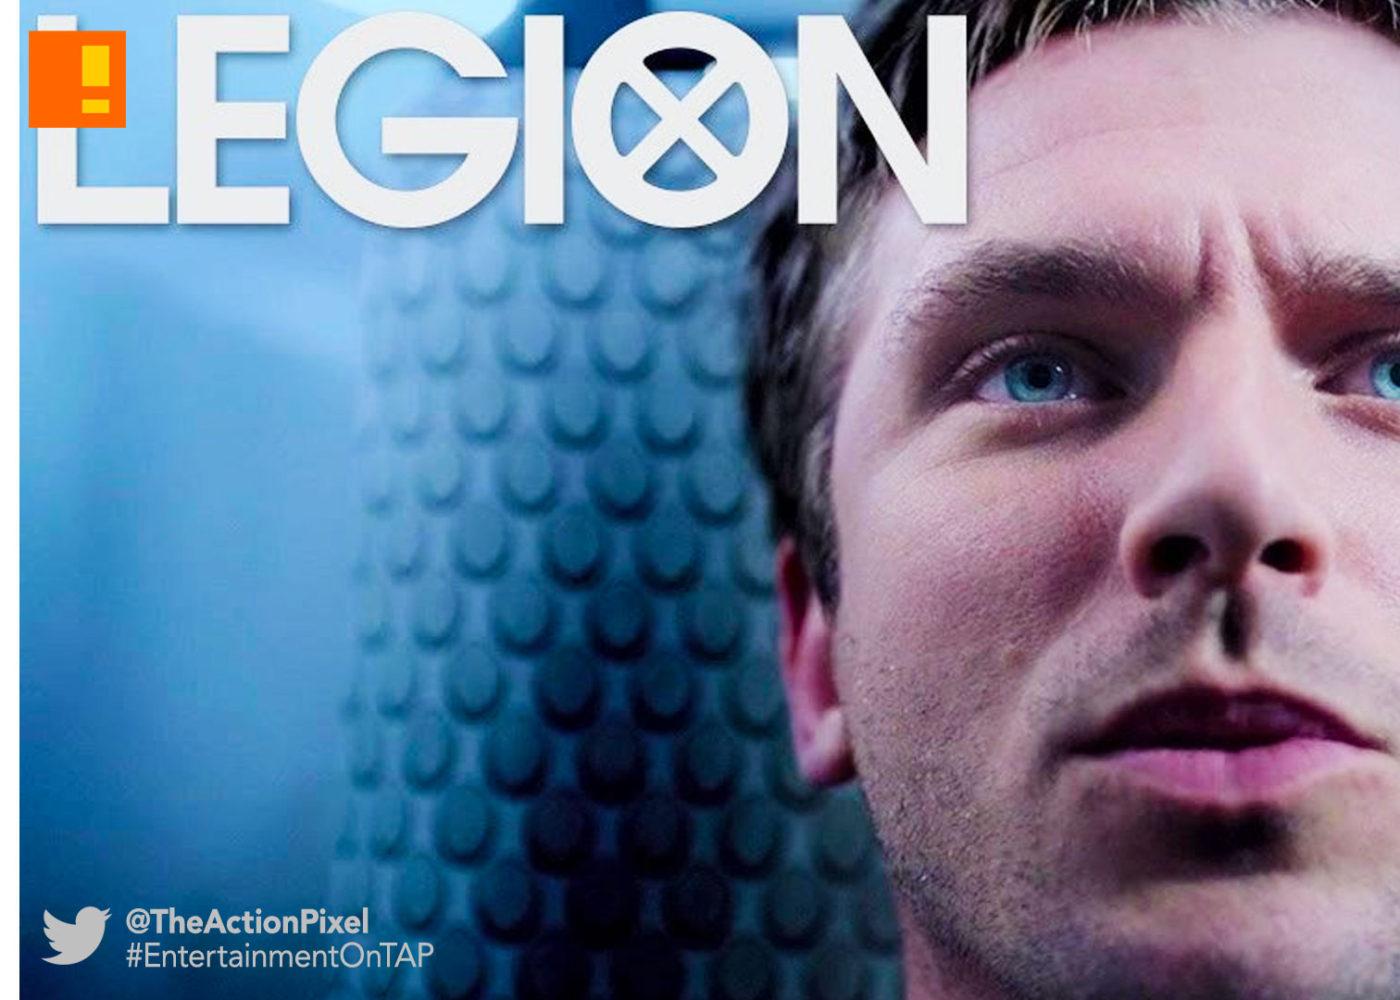 legion, david haller, fox, marvel, the action pixel, evolve, trailer, entertainment on tap